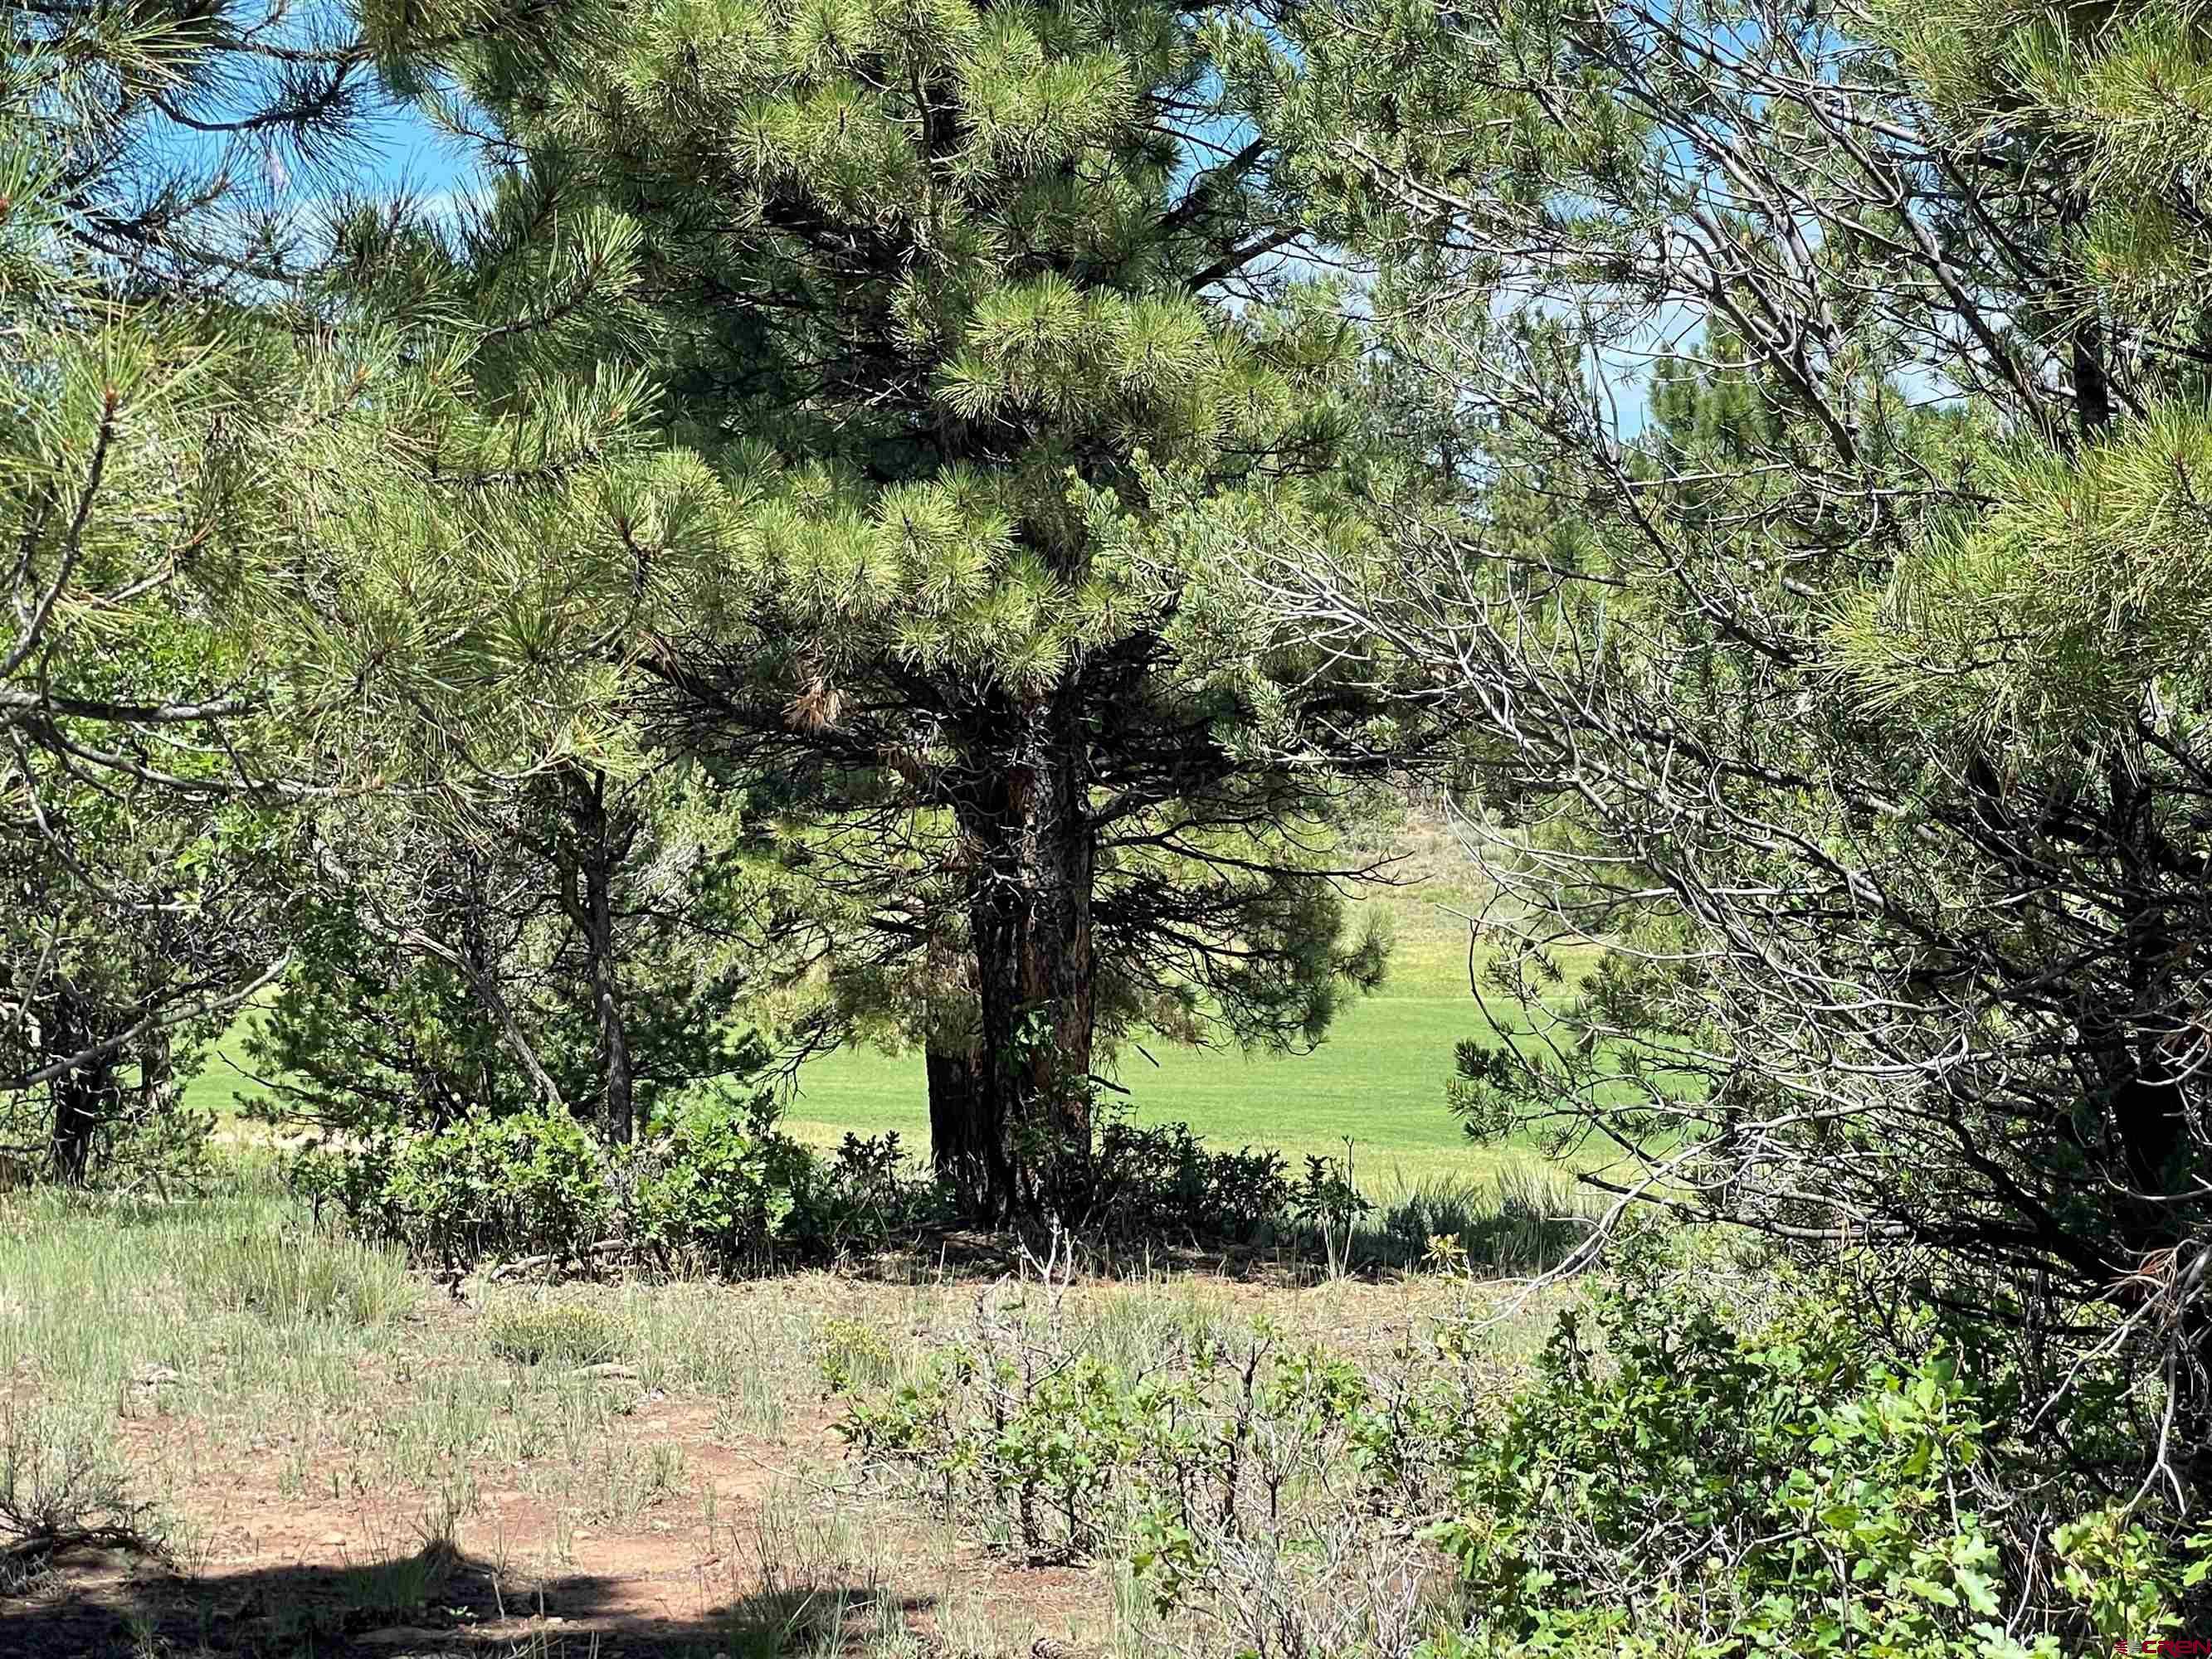 Tbd (lot 539) N Badger Trail Property Photo